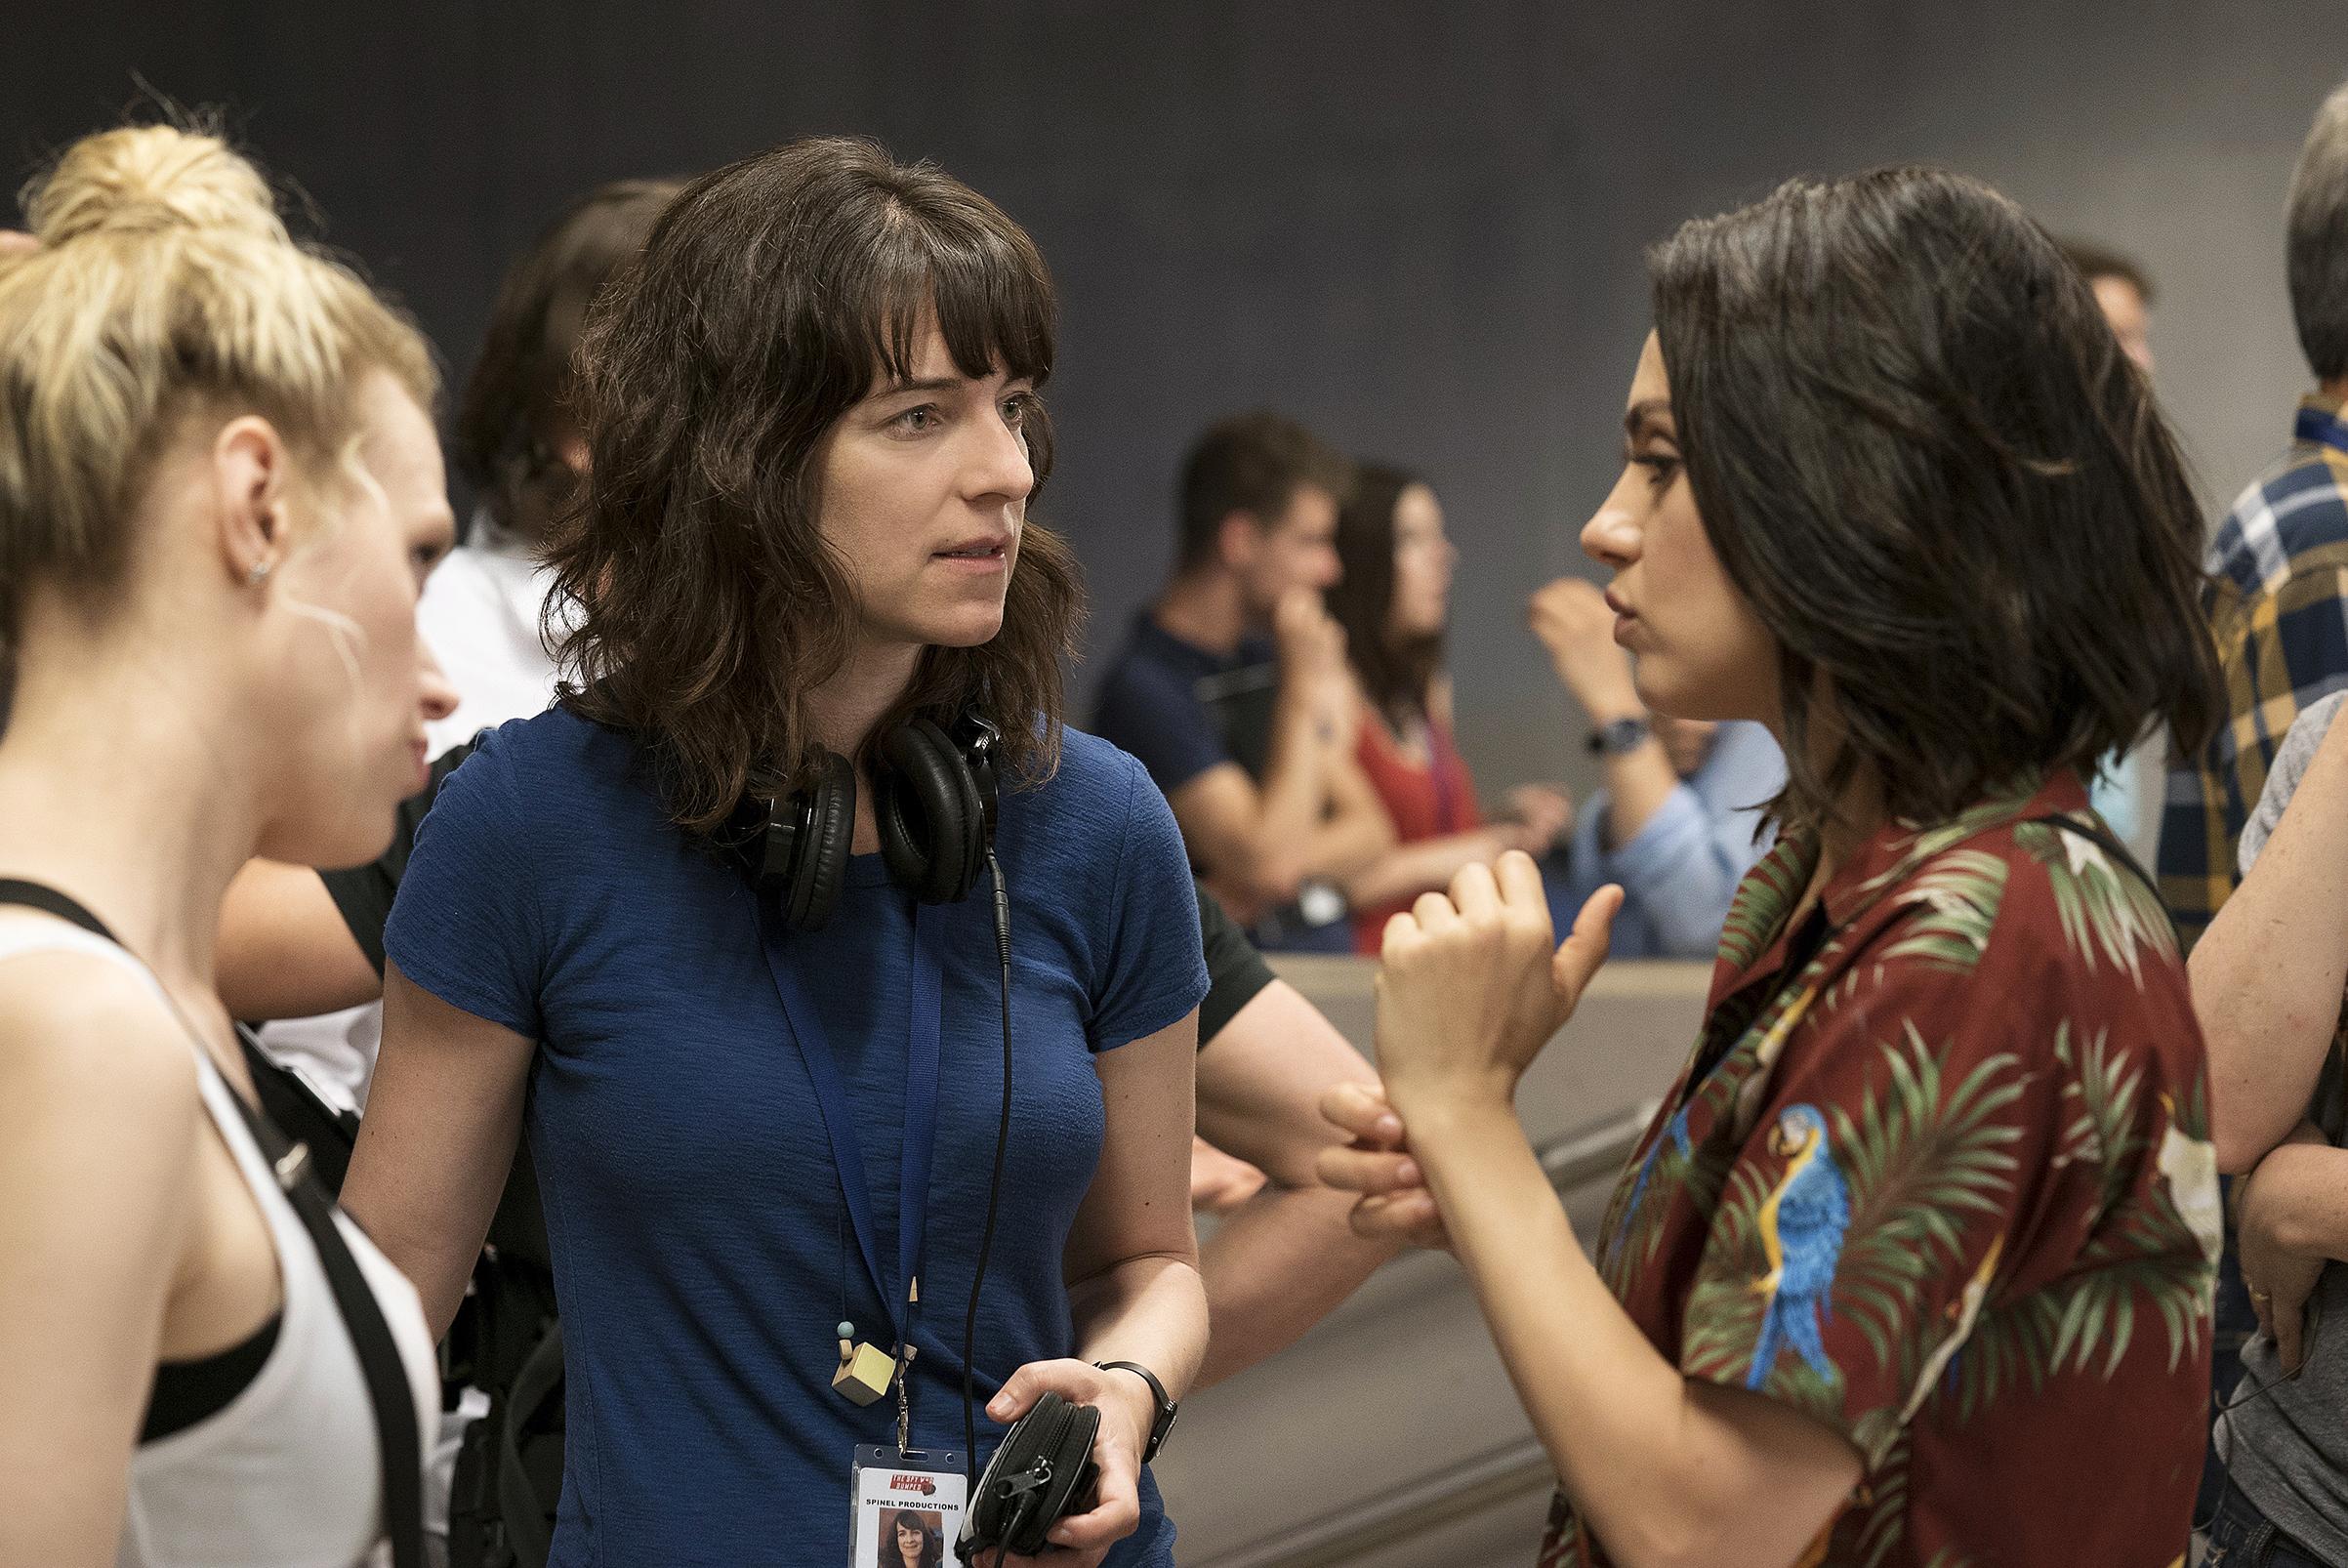 Director Fogel saw McKinnon and Kunis develop a friendship offscreen